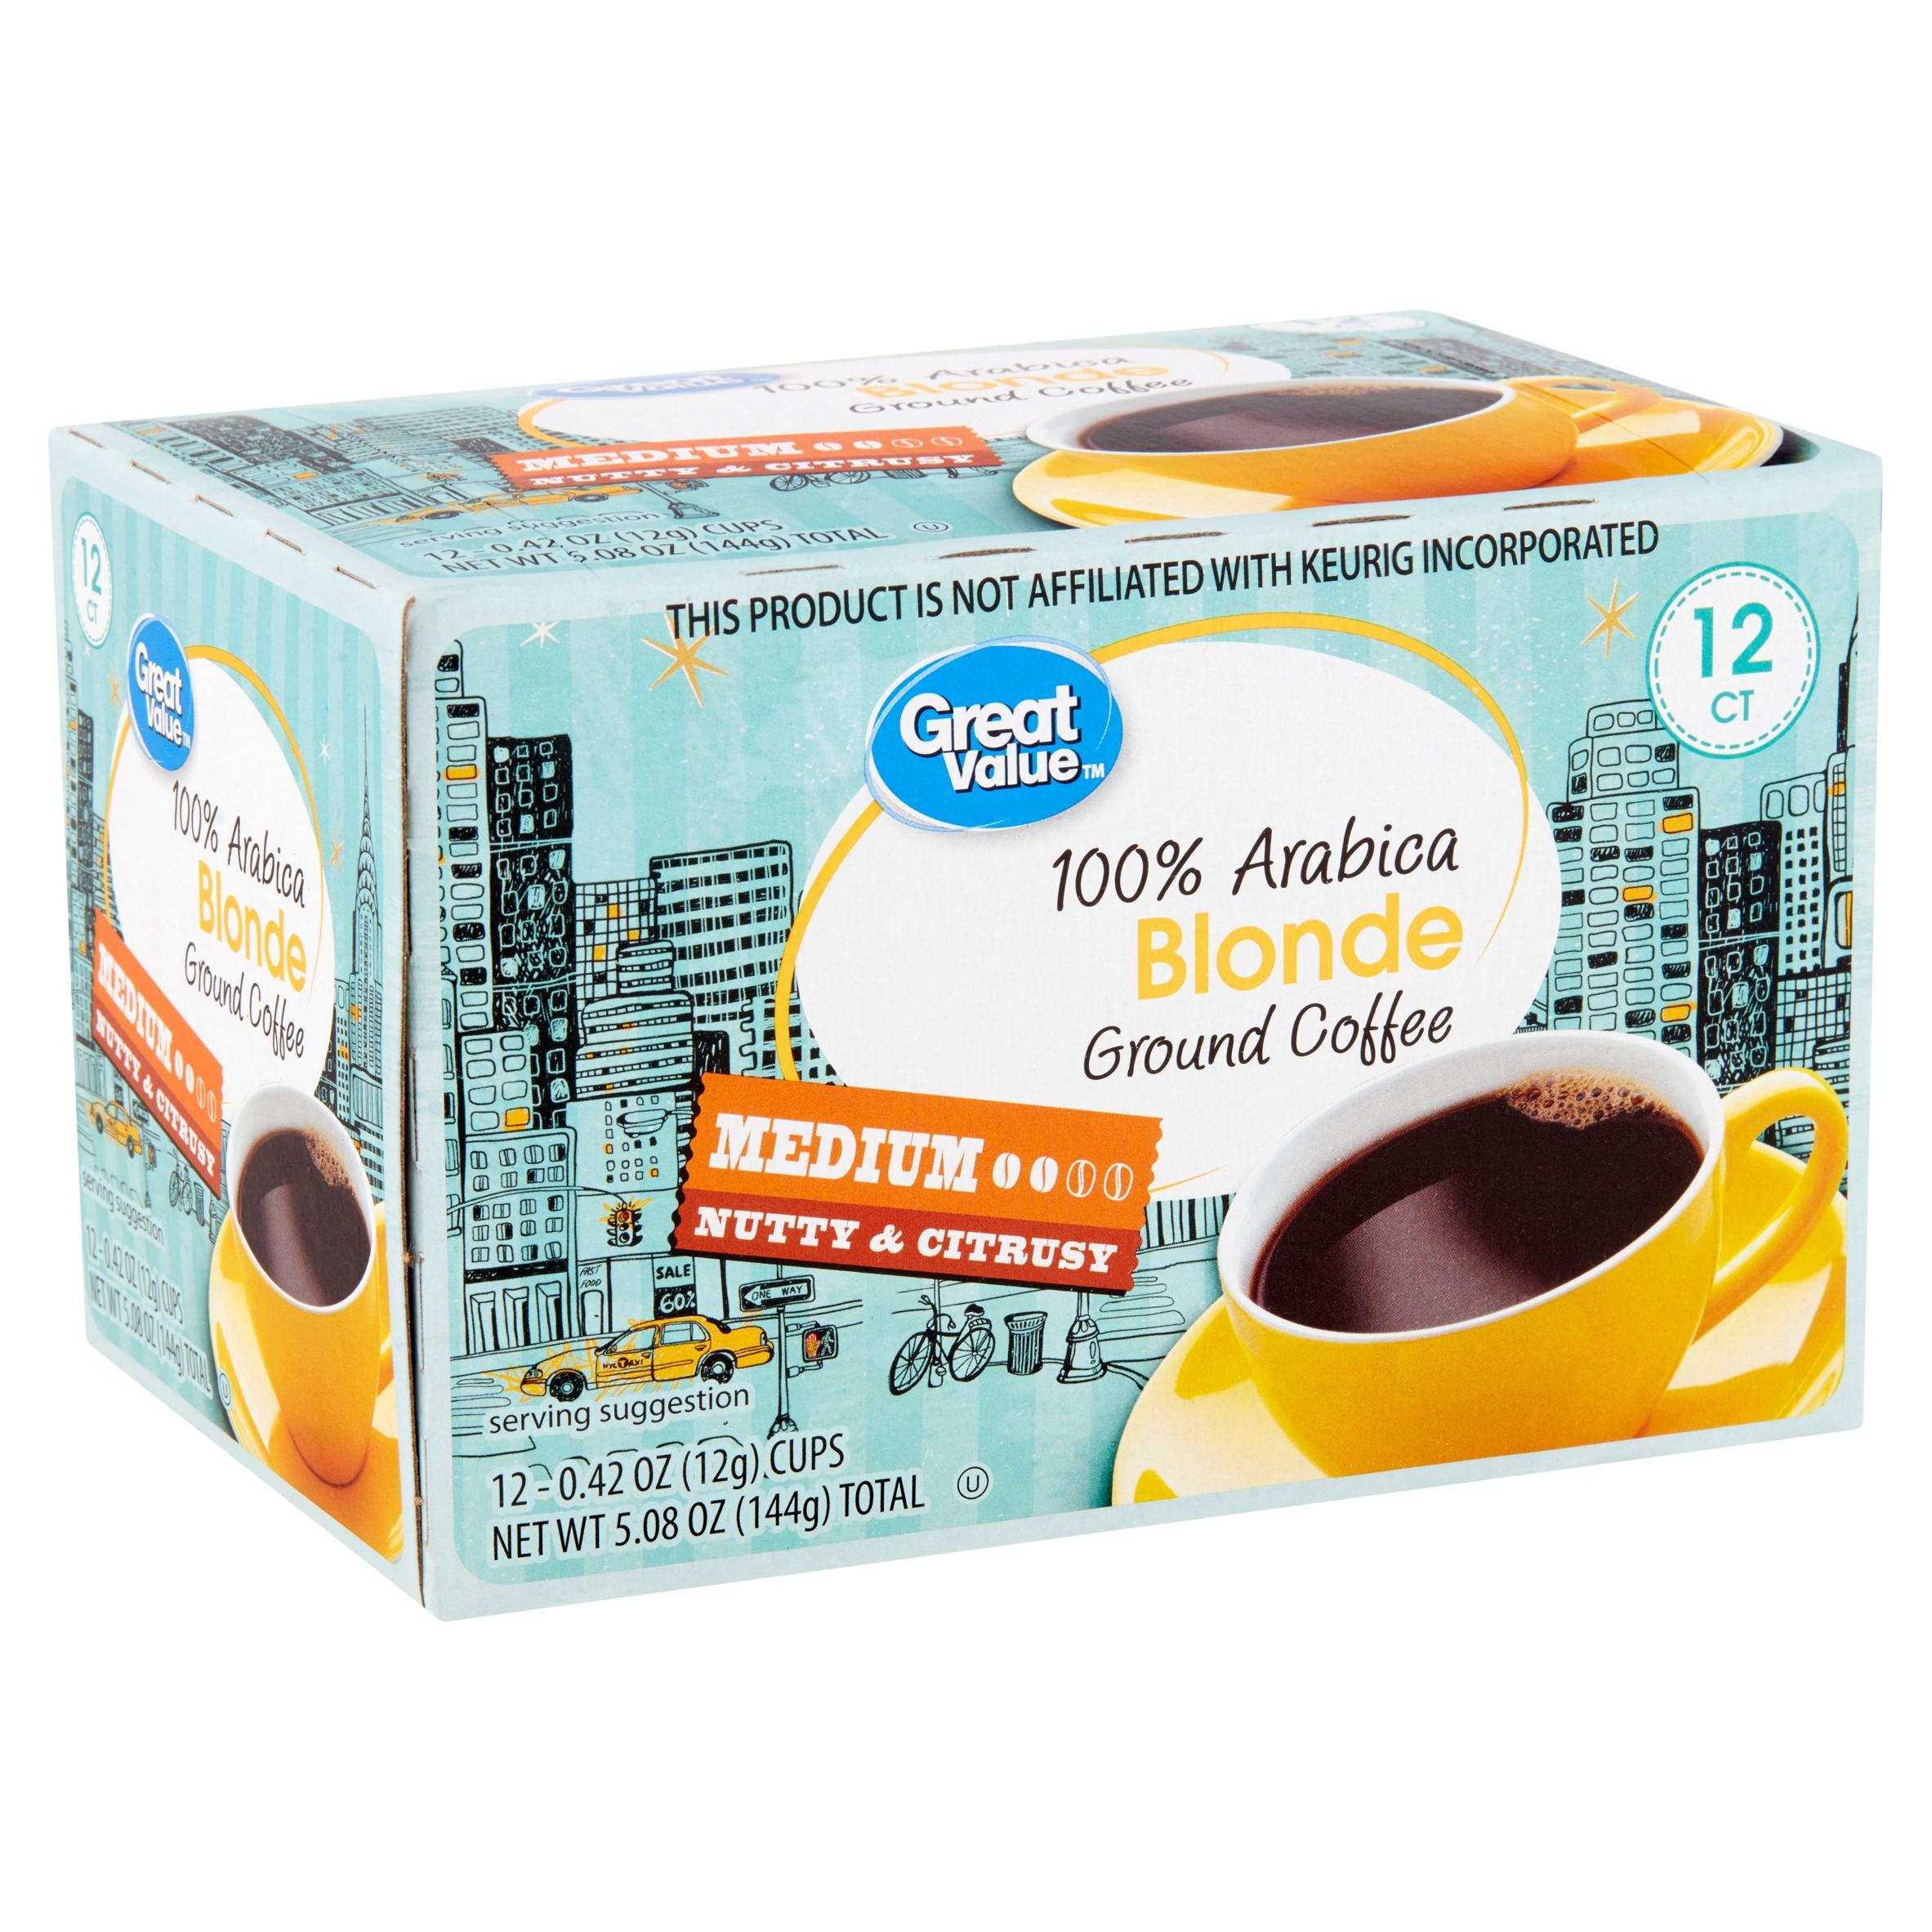 Great Value 100% Arabica Blonde Medium Ground Coffee, 0.42 oz, 12 count